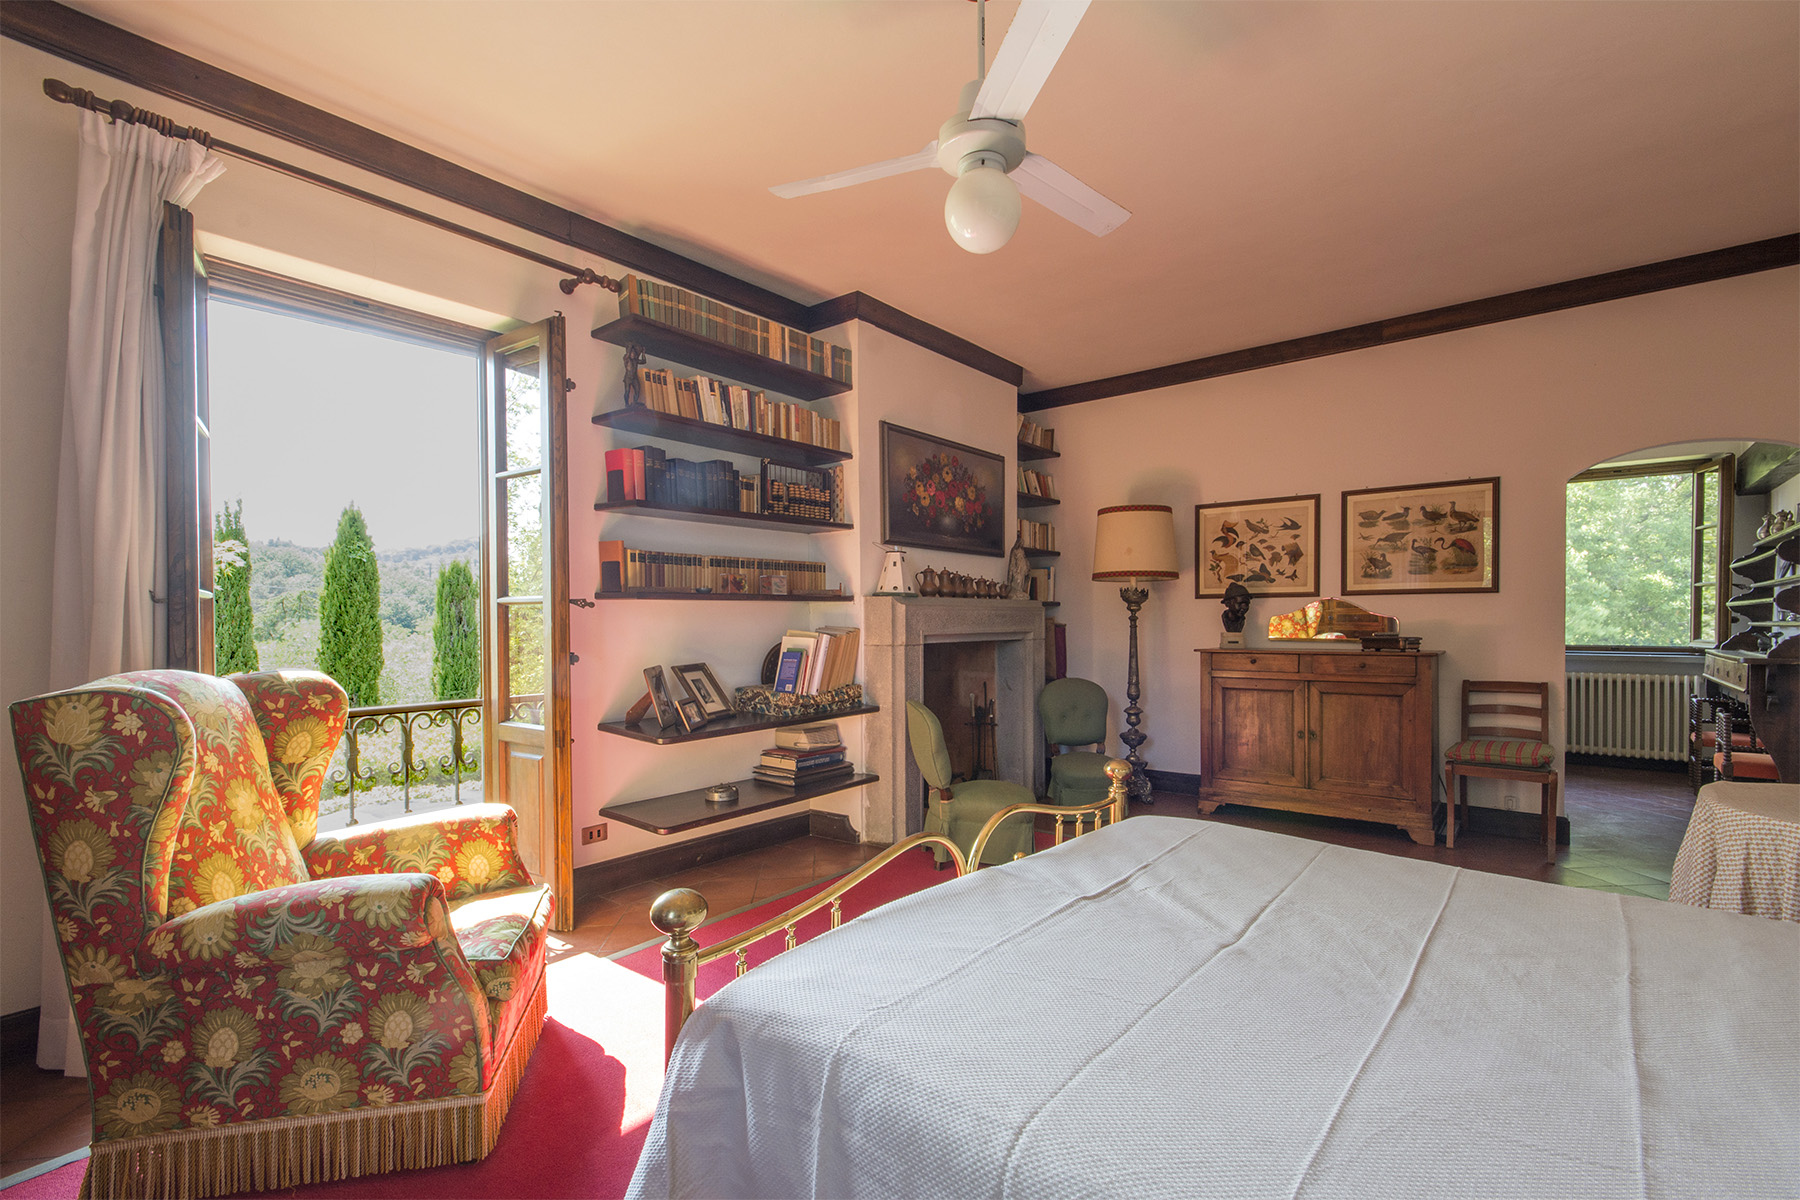 Villa in Vendita a Lucca: 5 locali, 600 mq - Foto 20